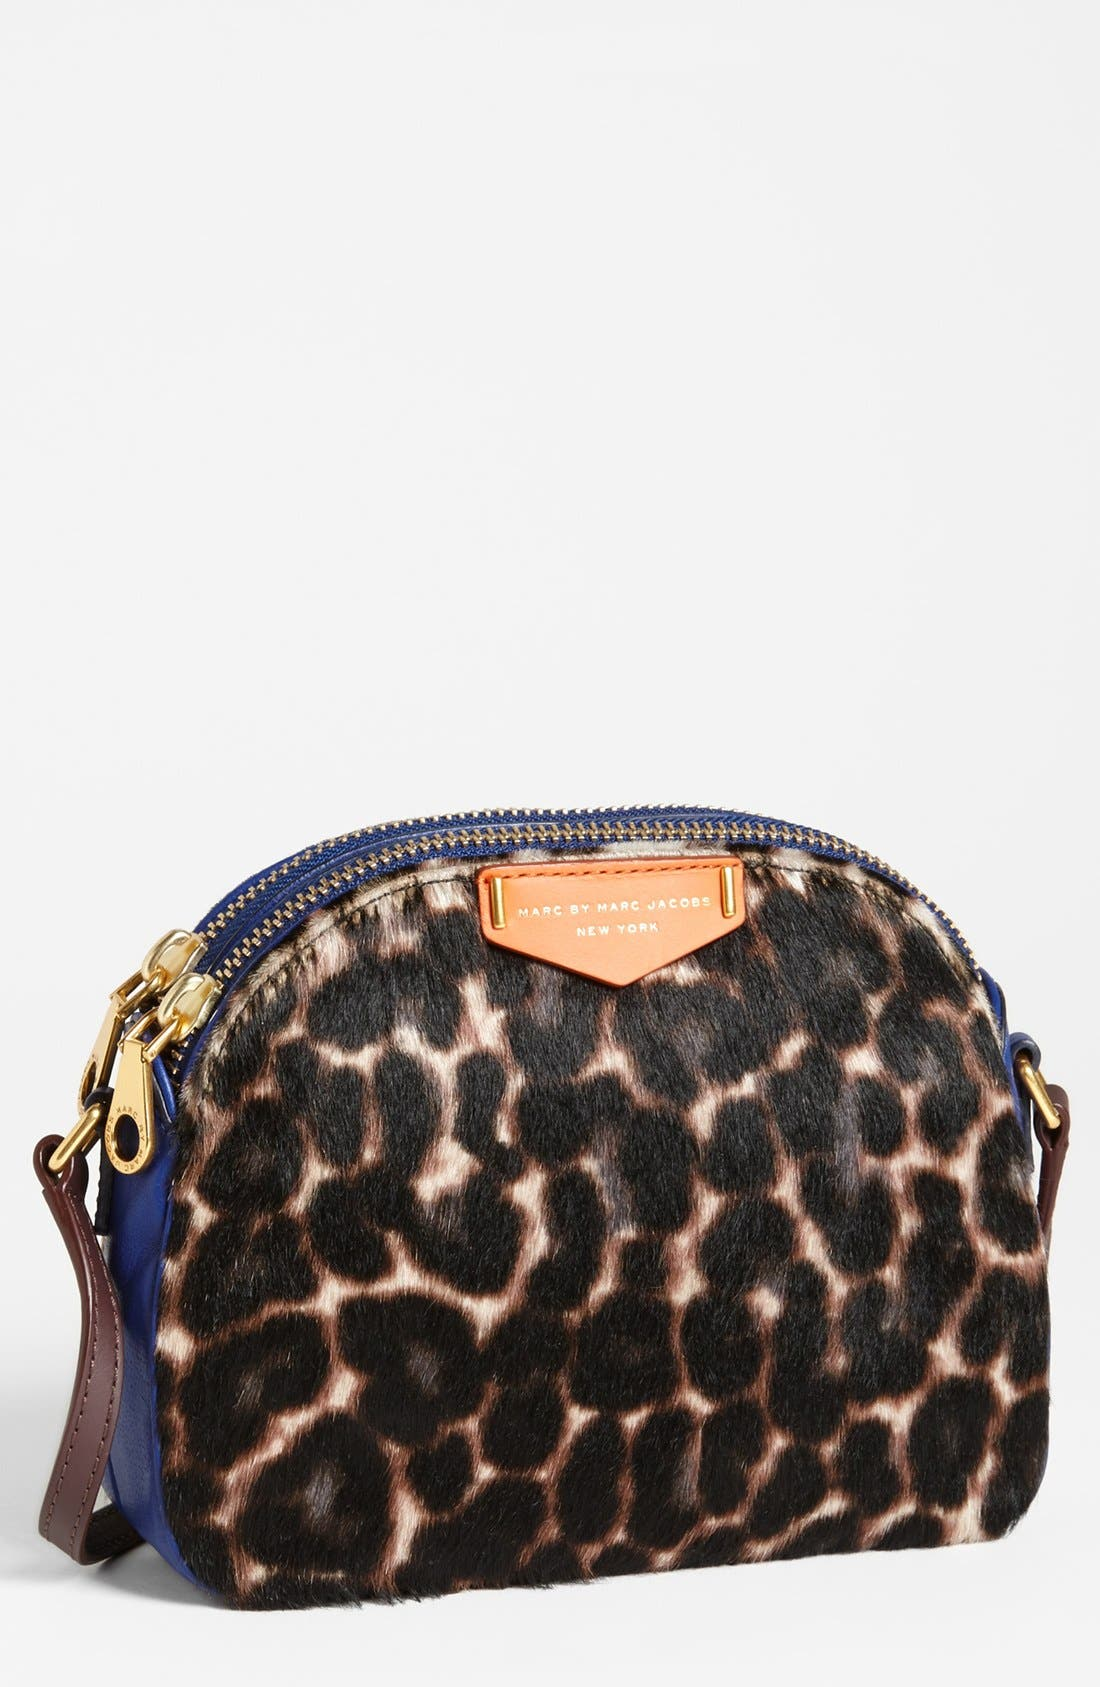 Main Image - MARC BY MARC JACOBS 'Lola' Calf Hair Crossbody Bag